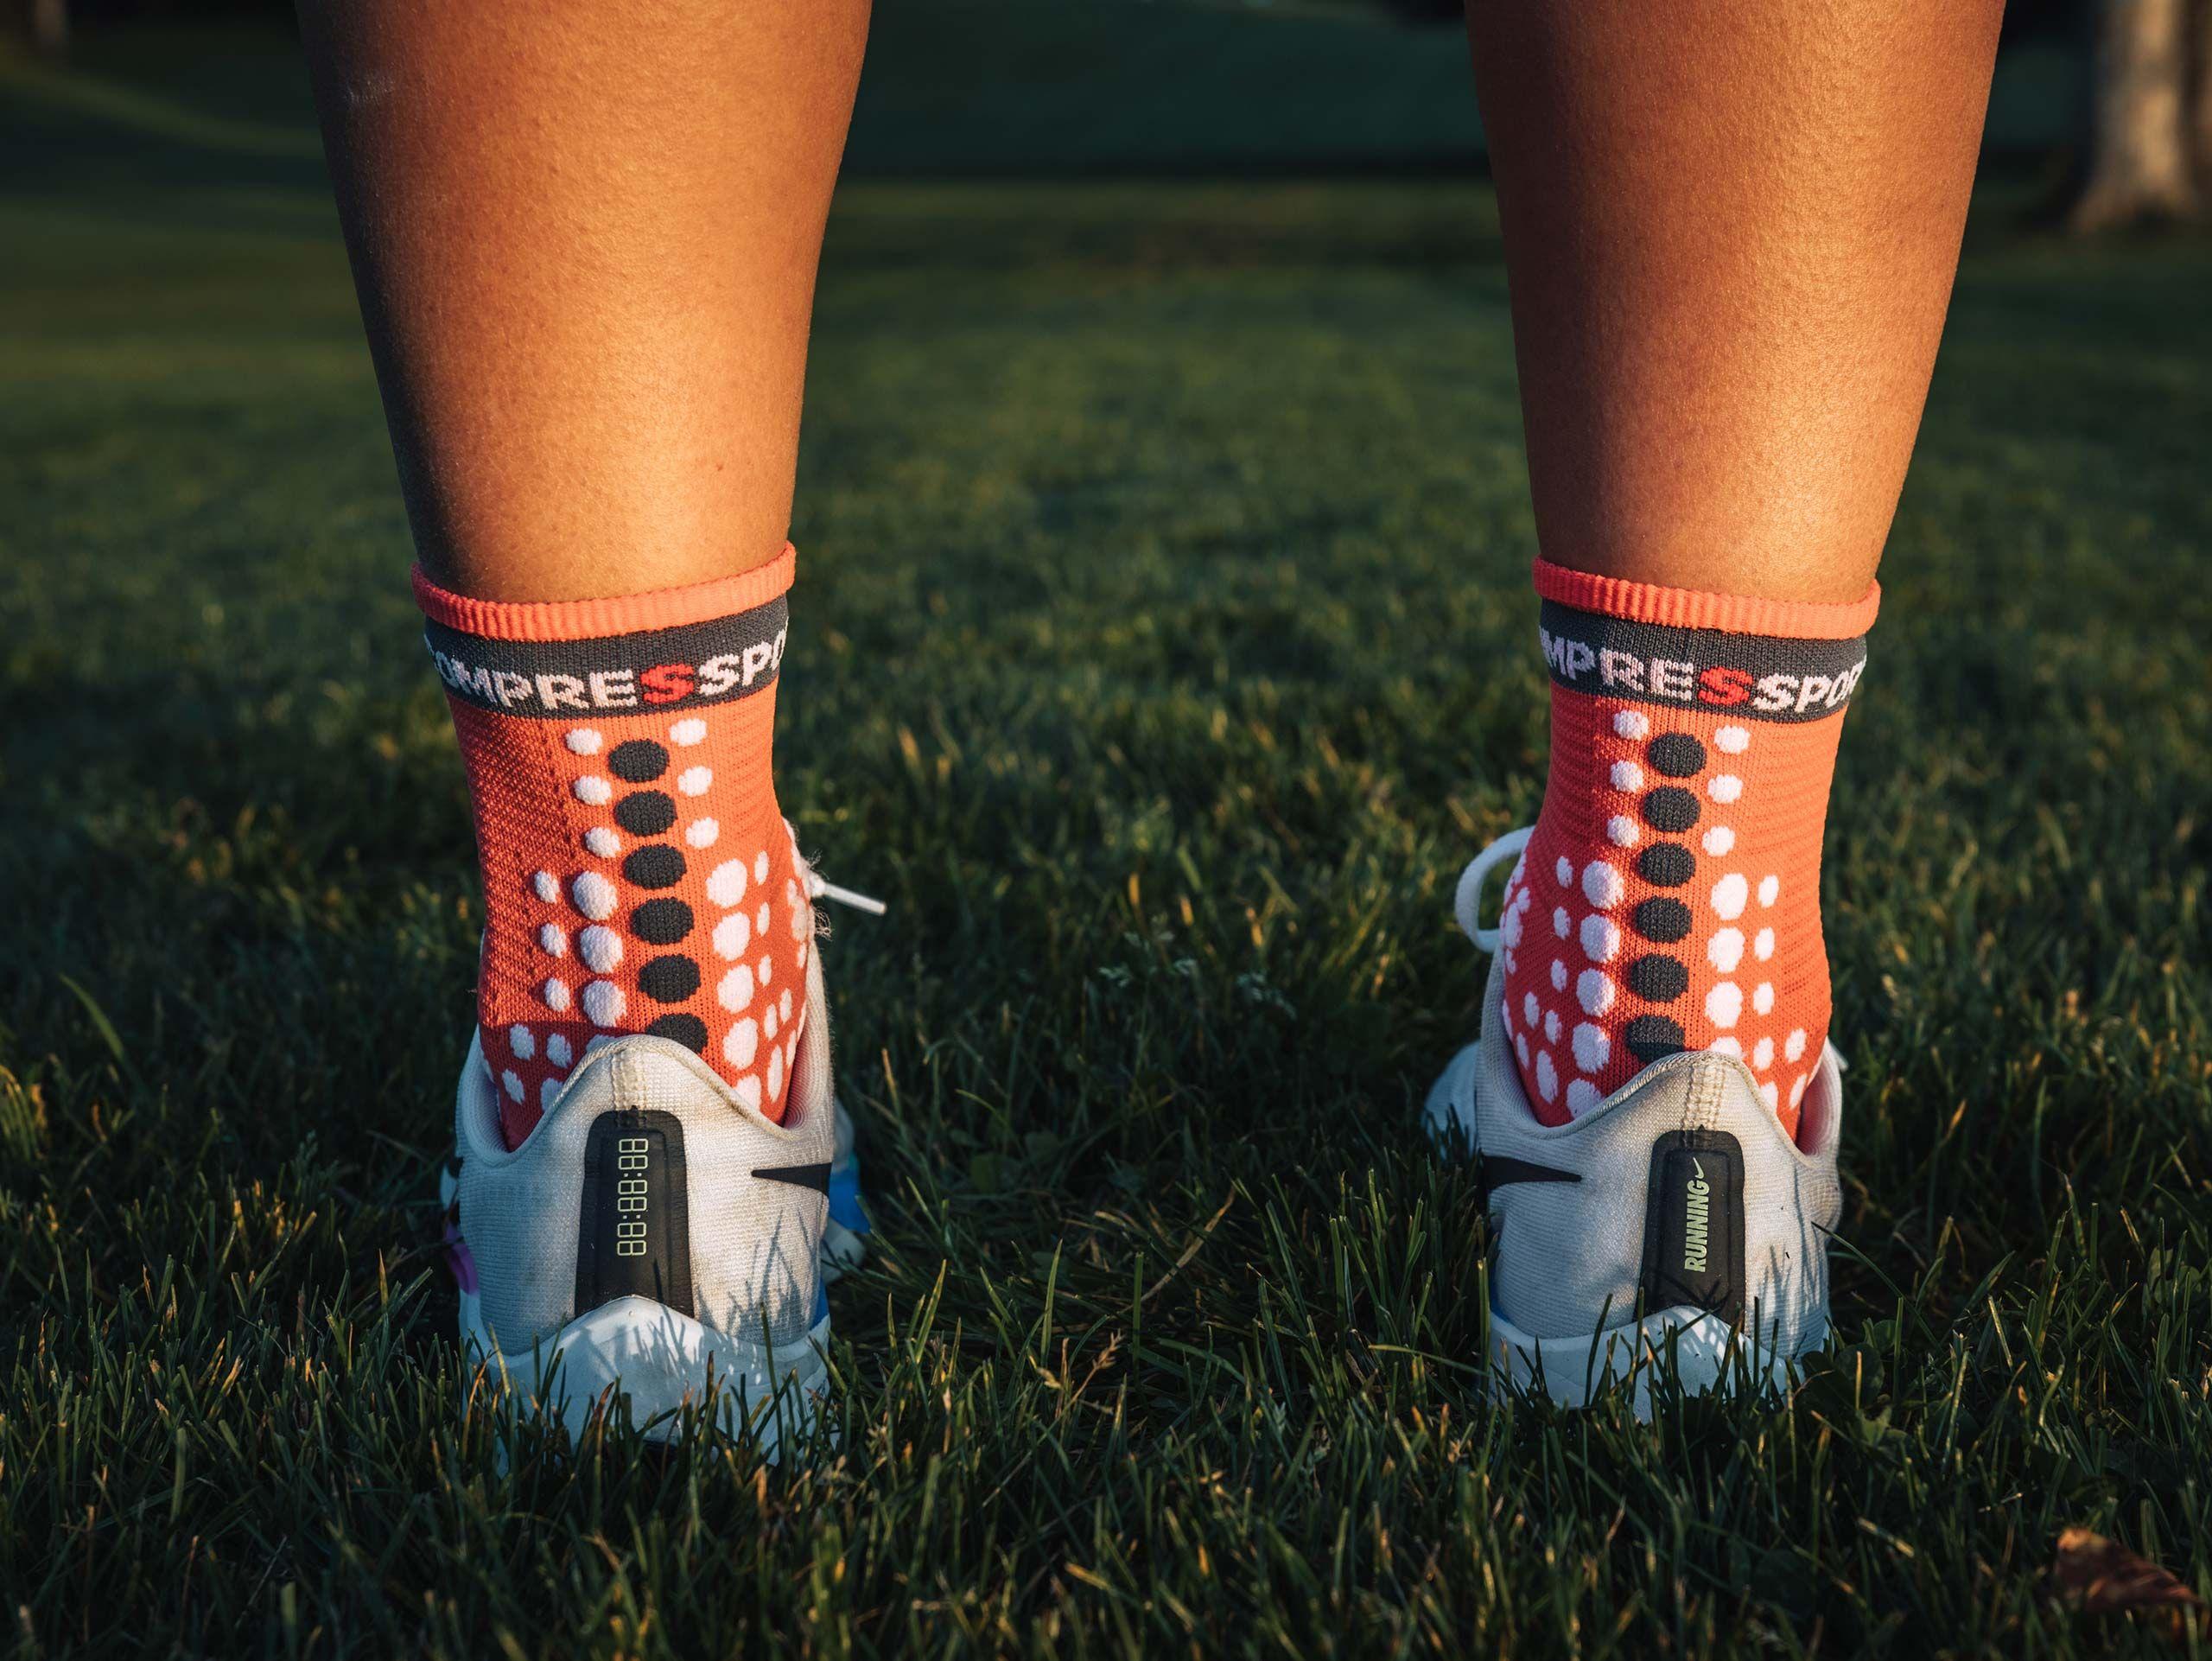 Pro Racing Socks v3.0 Run High - Coral